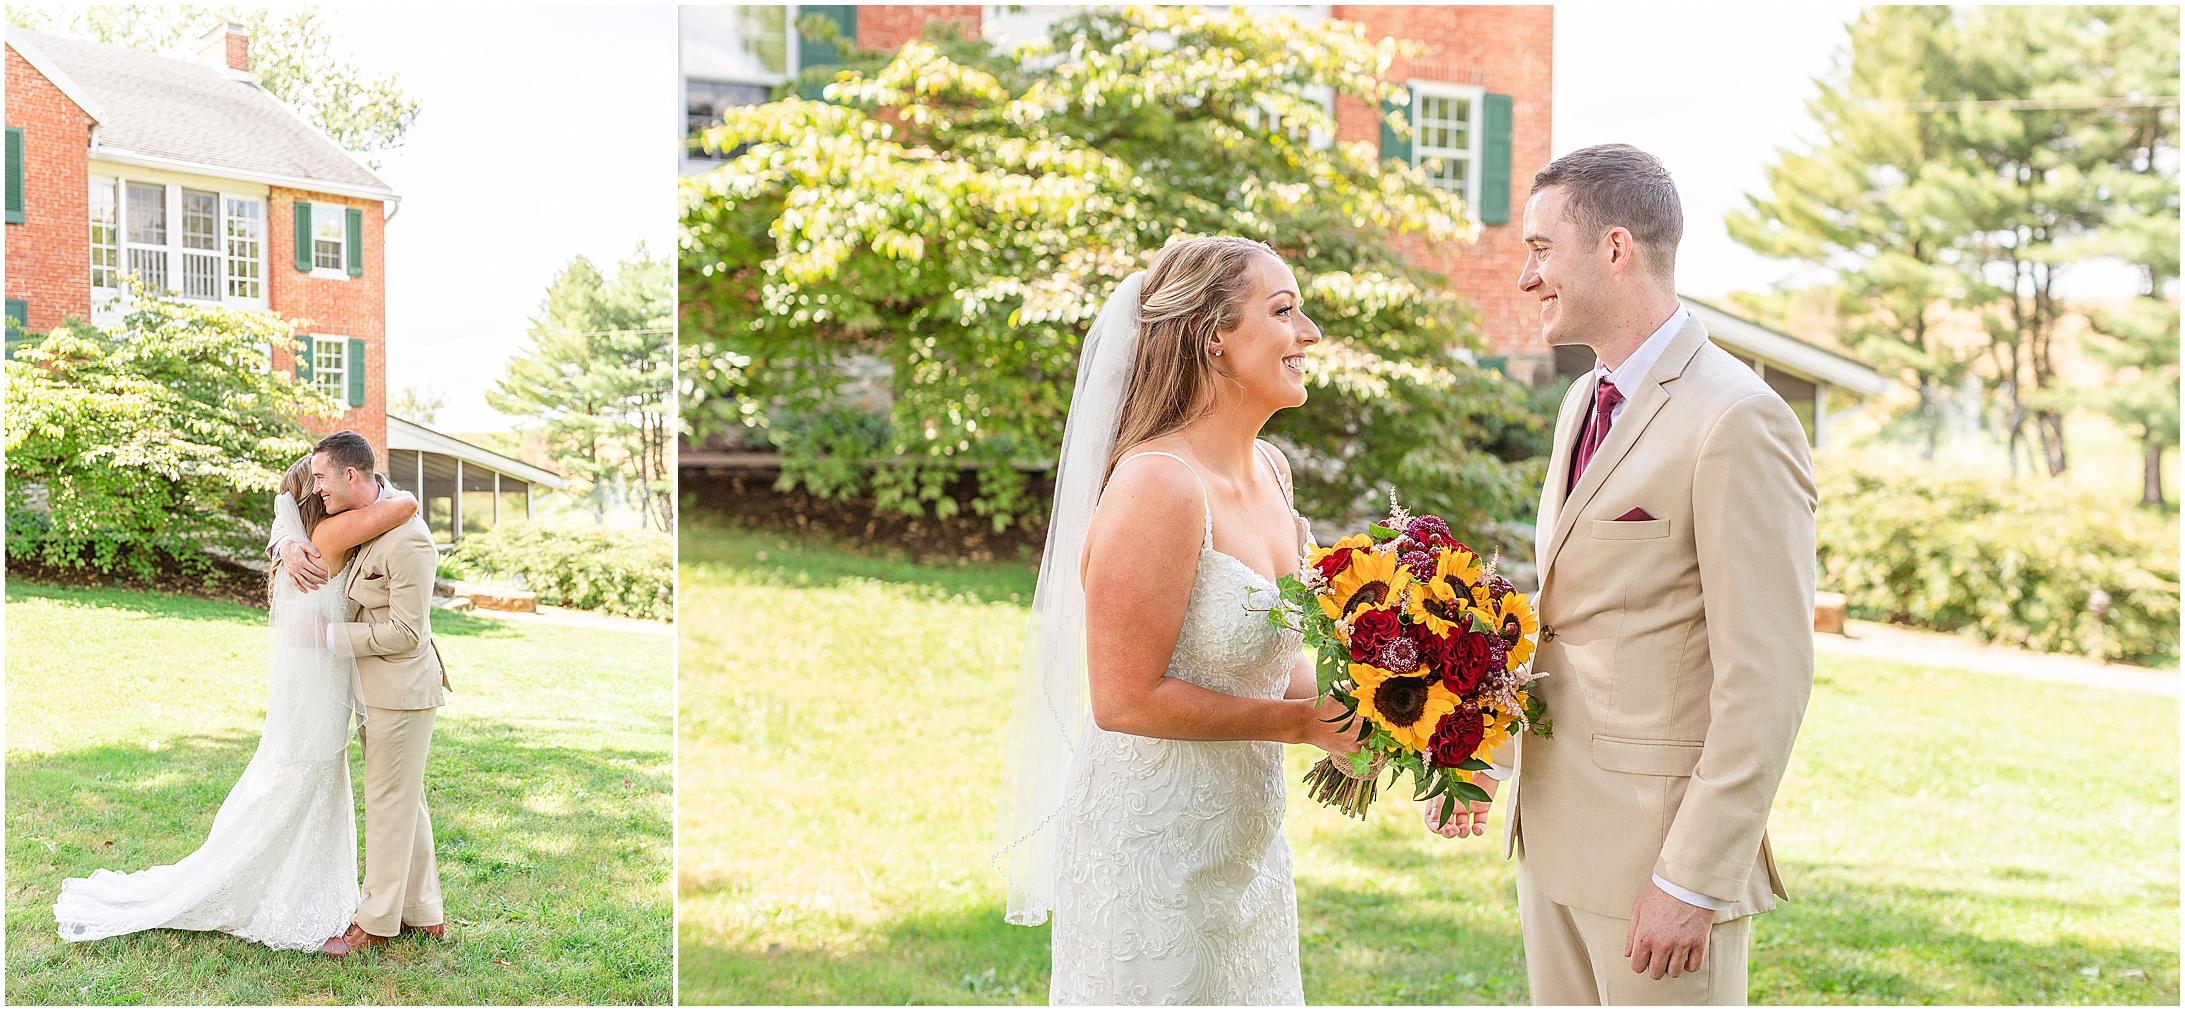 Christian-Royer-House-Wedding-Photos_0537.jpg